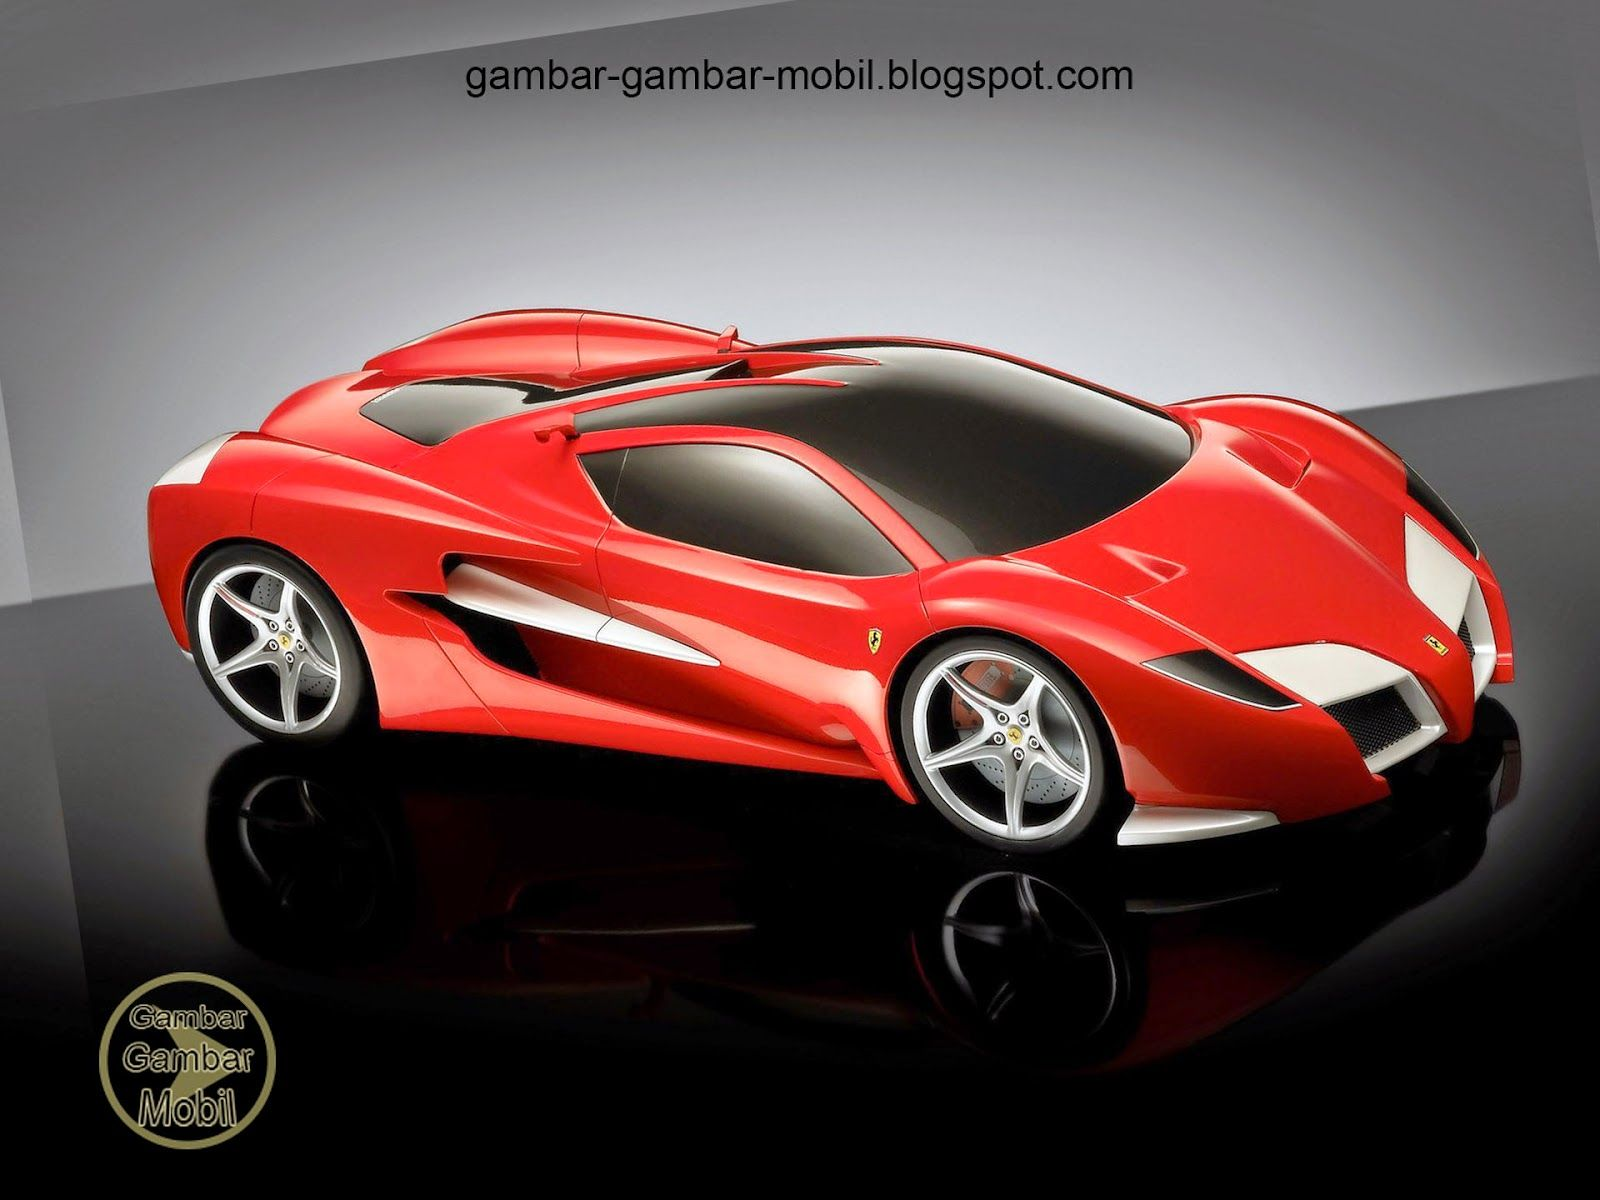 Gambar Mobil Ferrari Gambar Gambar Mobil Ferrari Mobil Mobil Balap